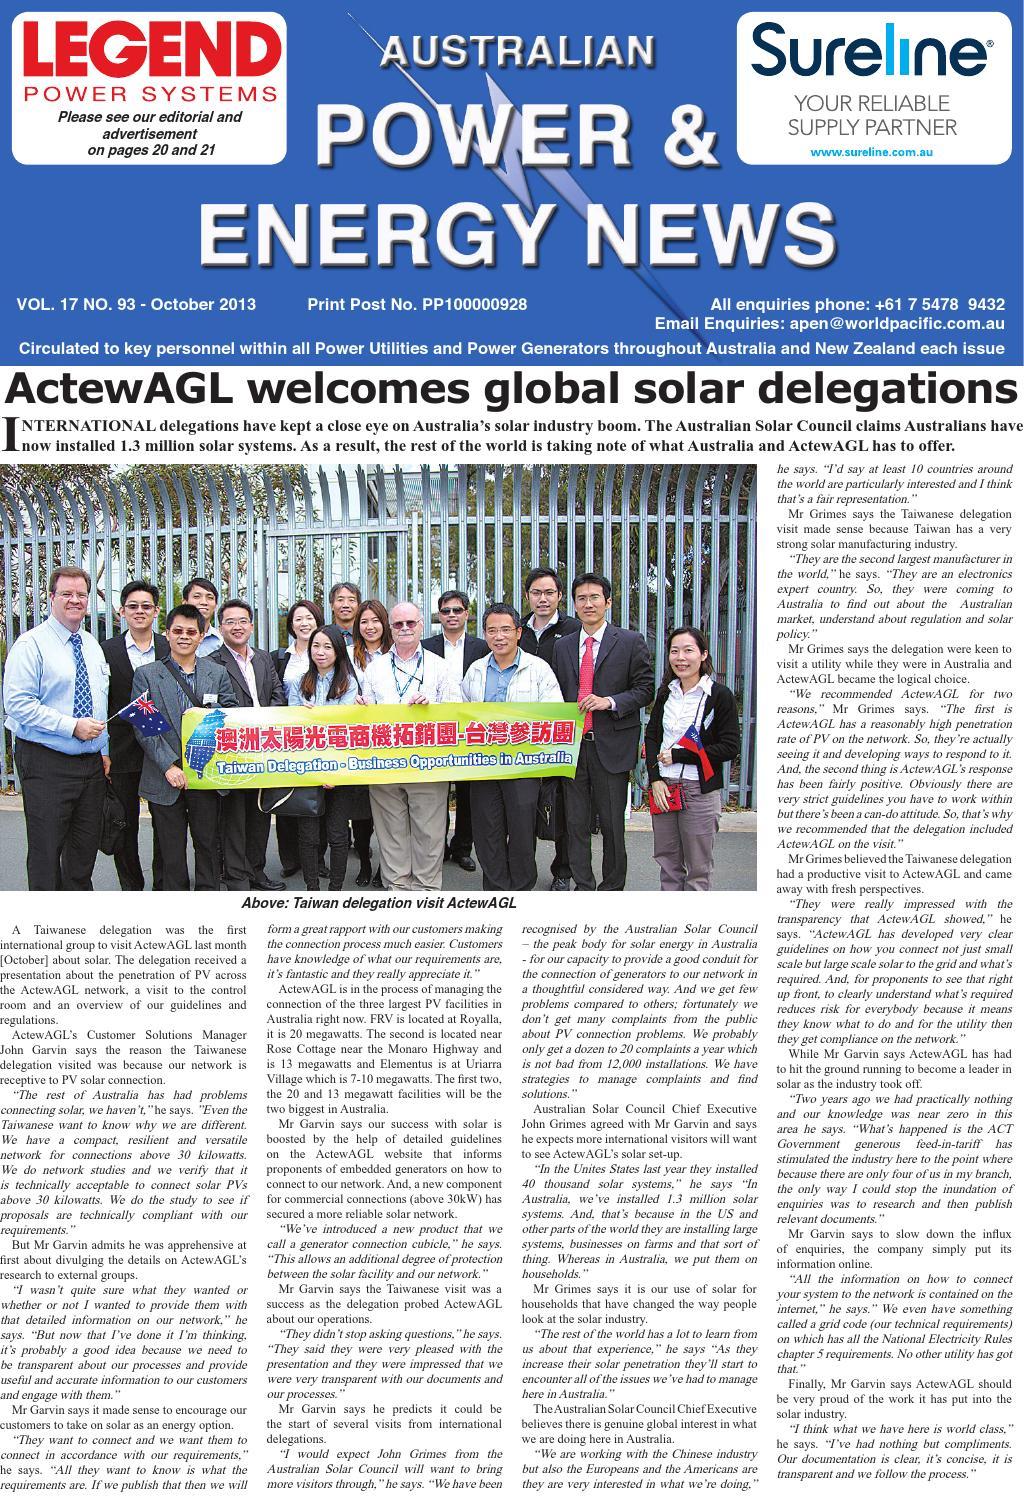 Australian Power & Energy News Vol 17 No 93 October 2013 by